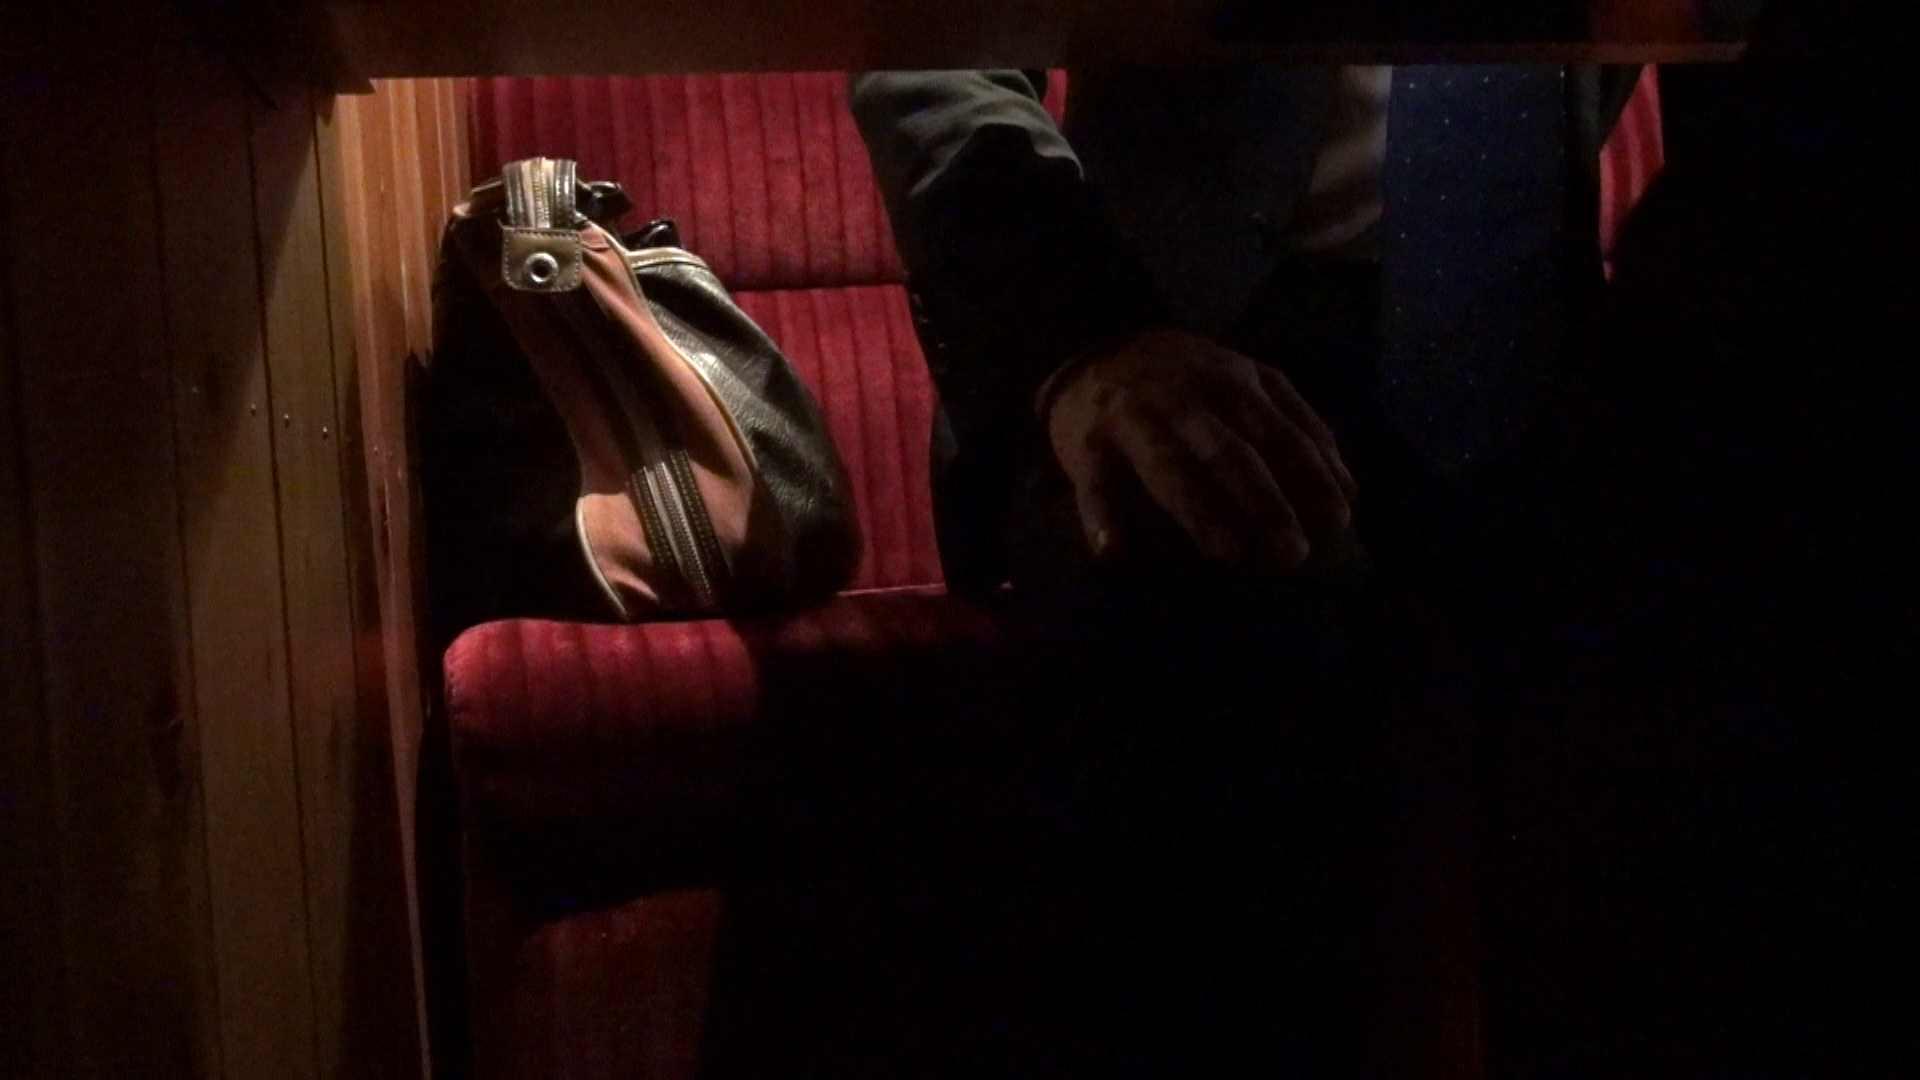 episode1 ヒロトさんと保険外交員との顔合わせ マンコバッチリ セックス無修正動画無料 13pic 4